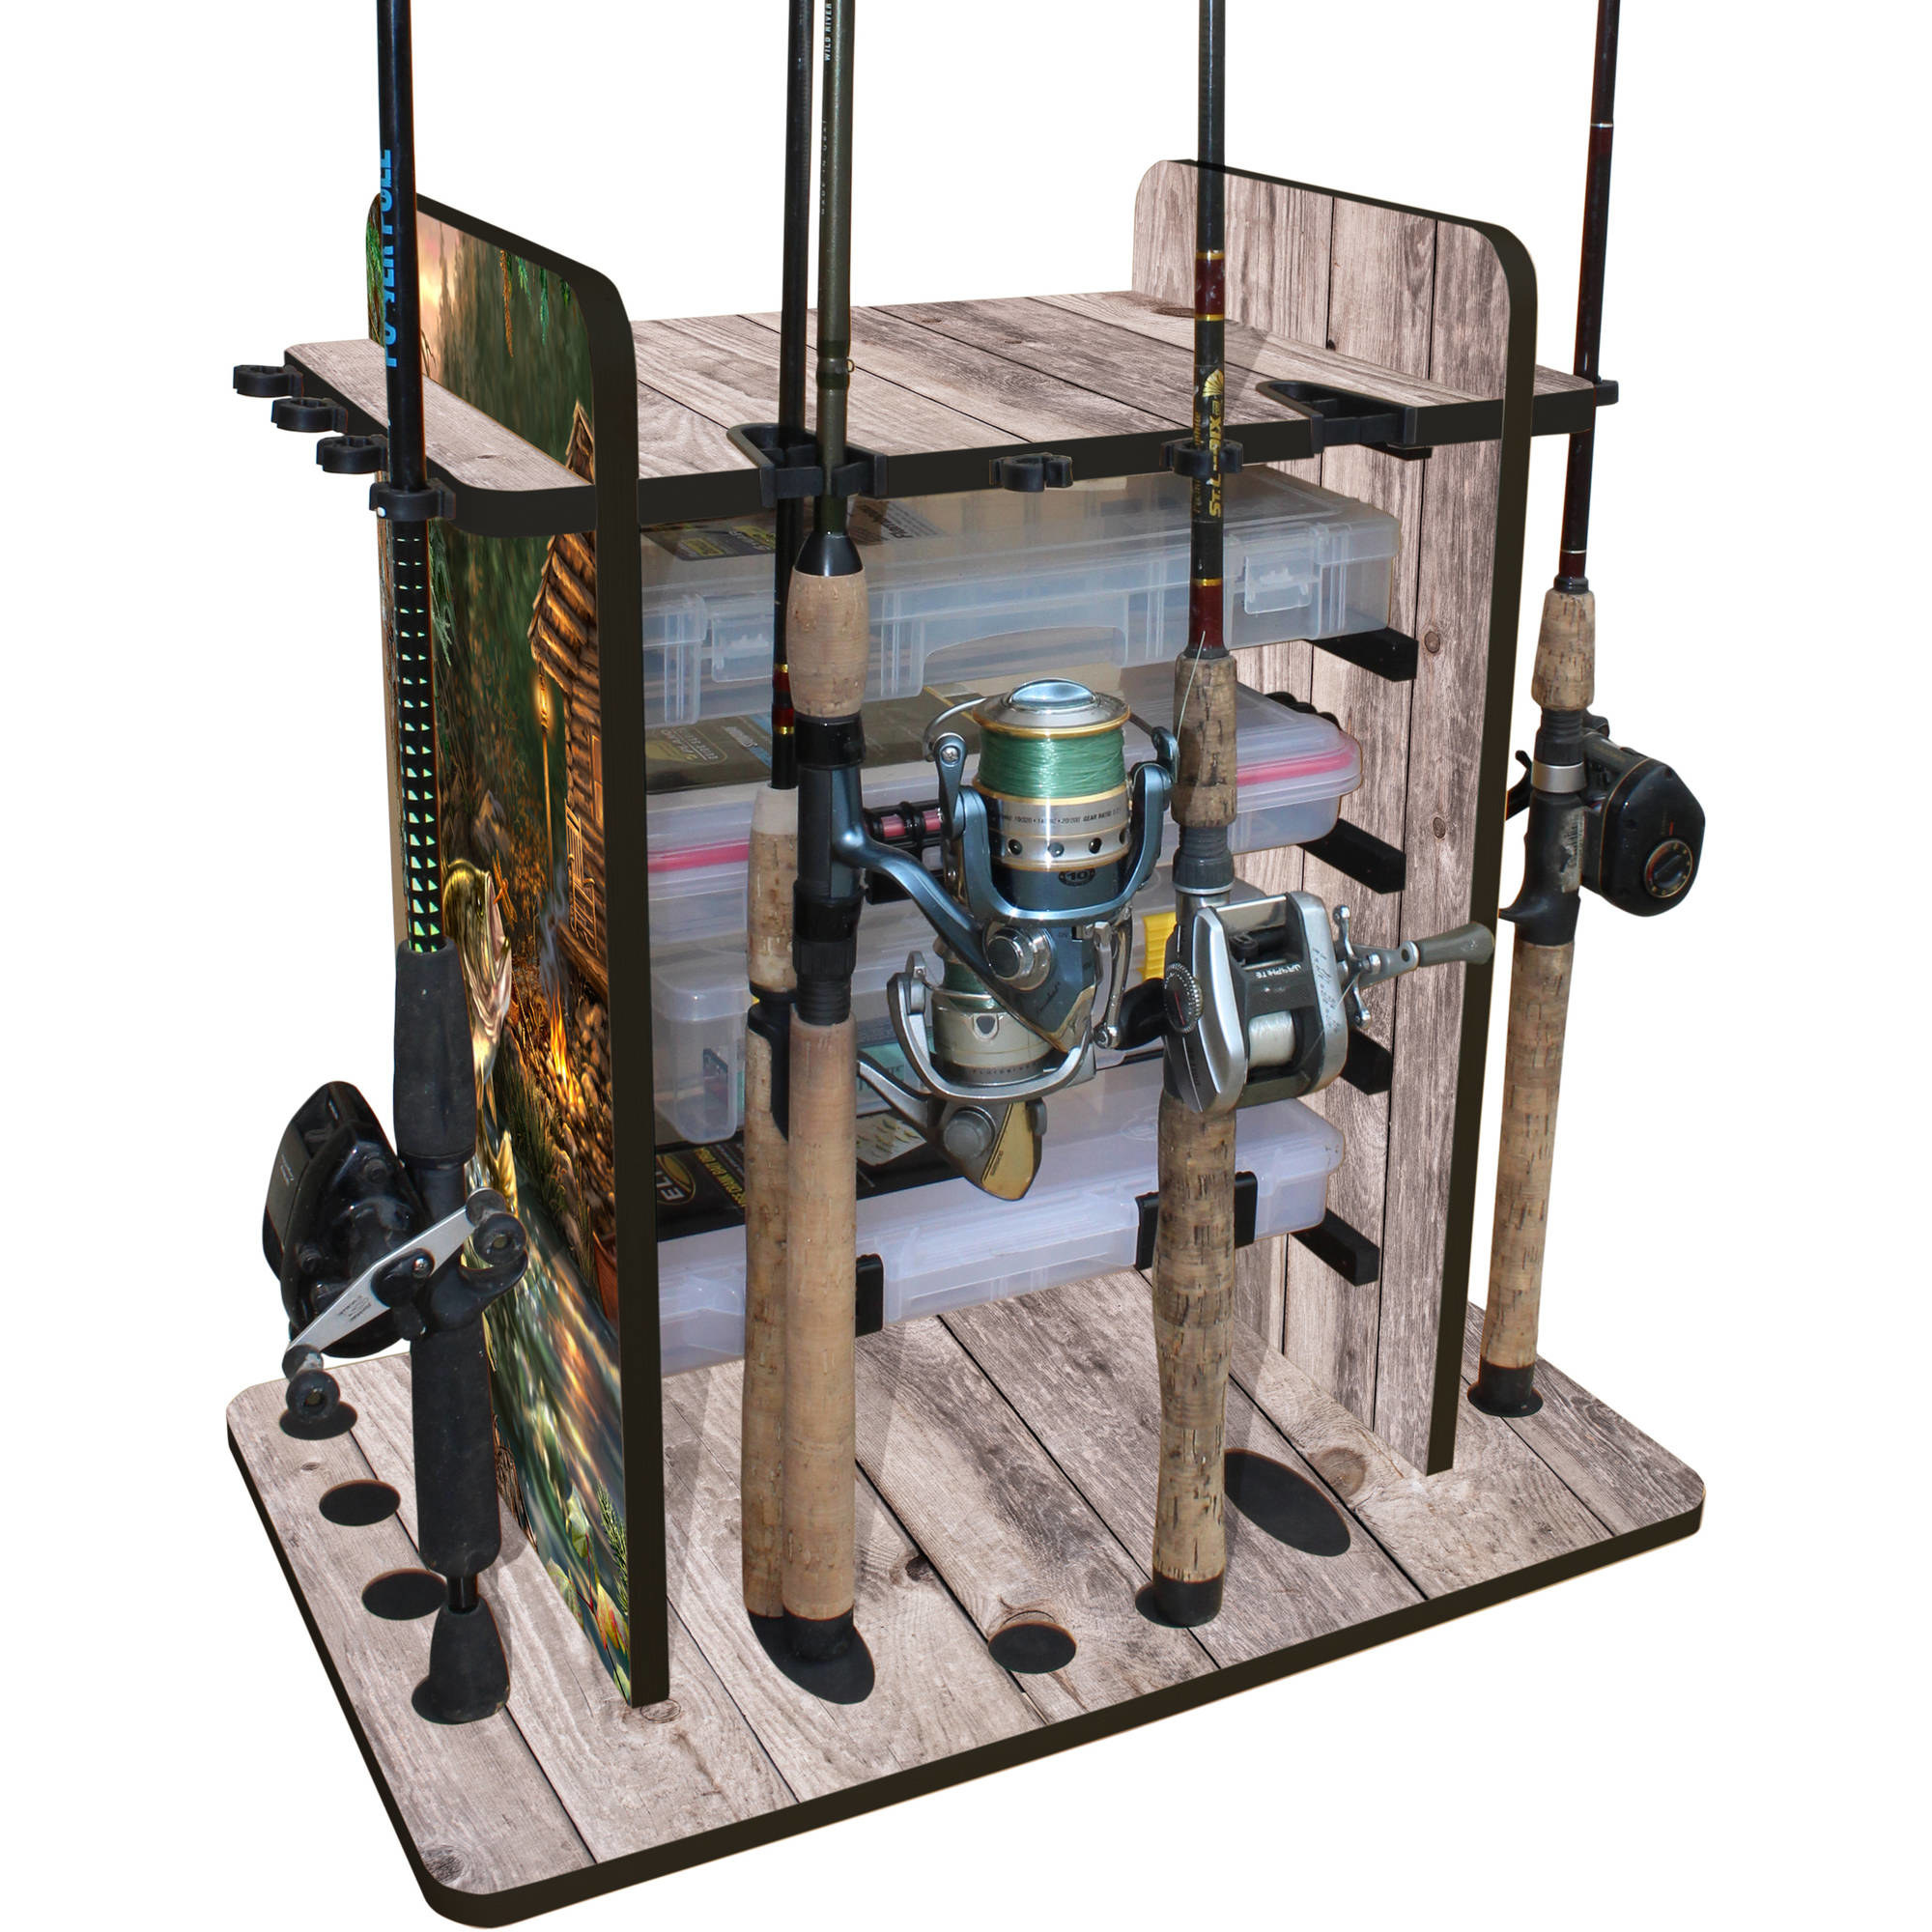 The Rush Creek Creations 14 Fishing Rod Rack with 4 Drawer Storage